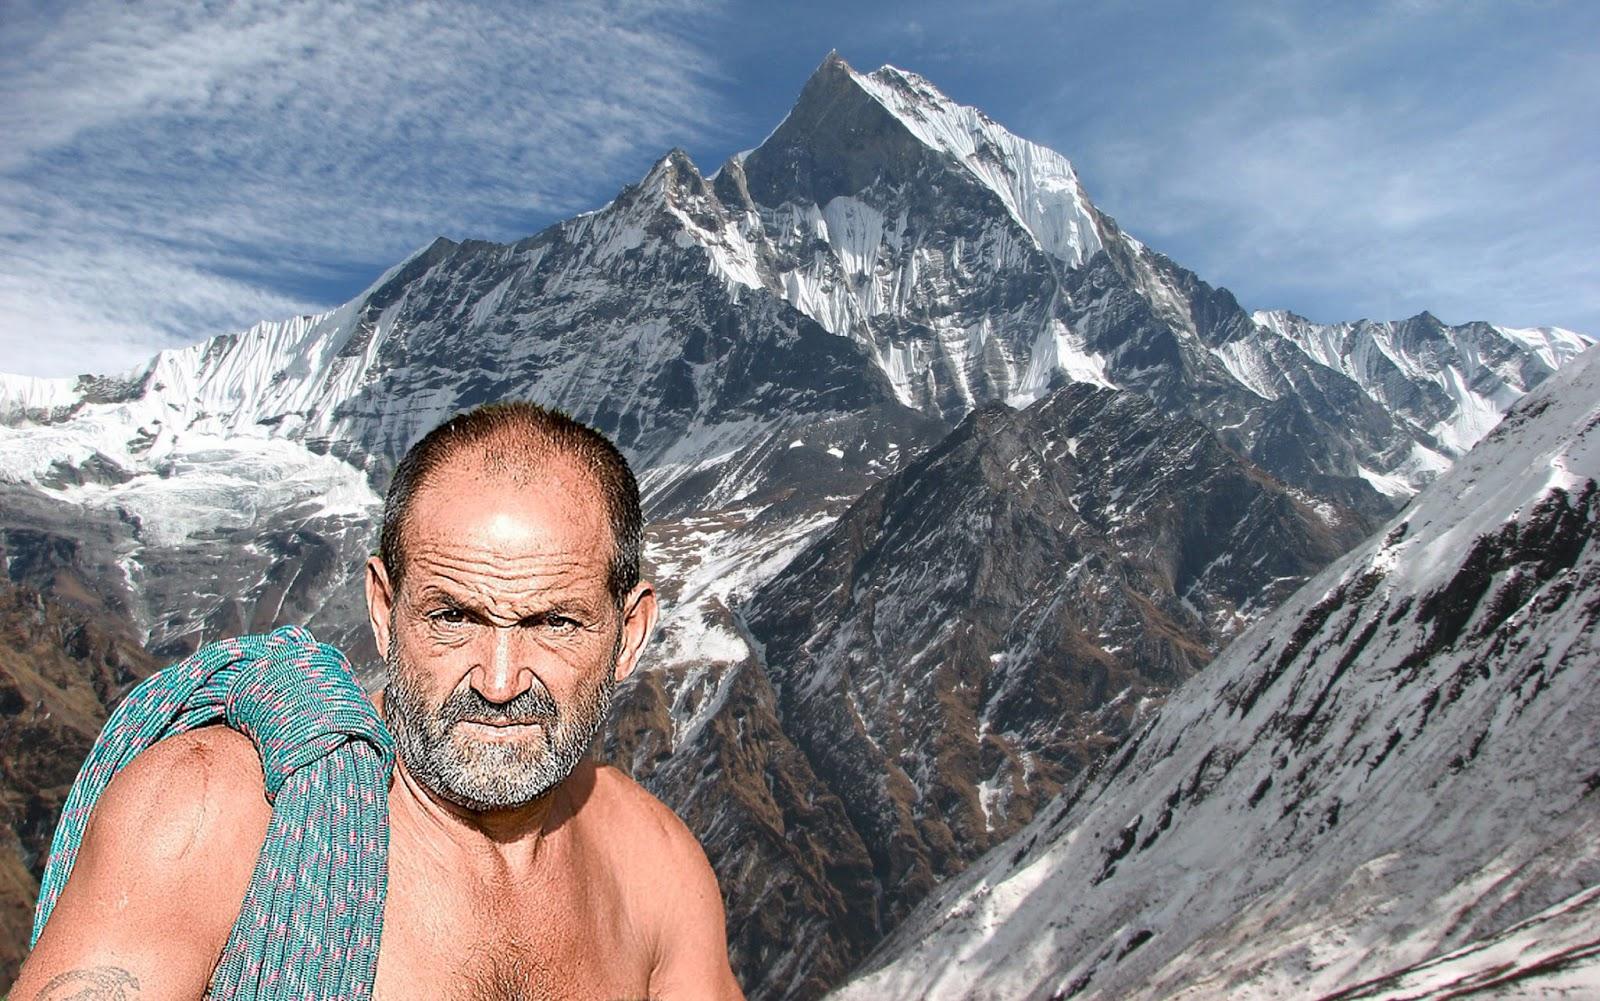 Juanito Oiarzabal - famous mountain climbers